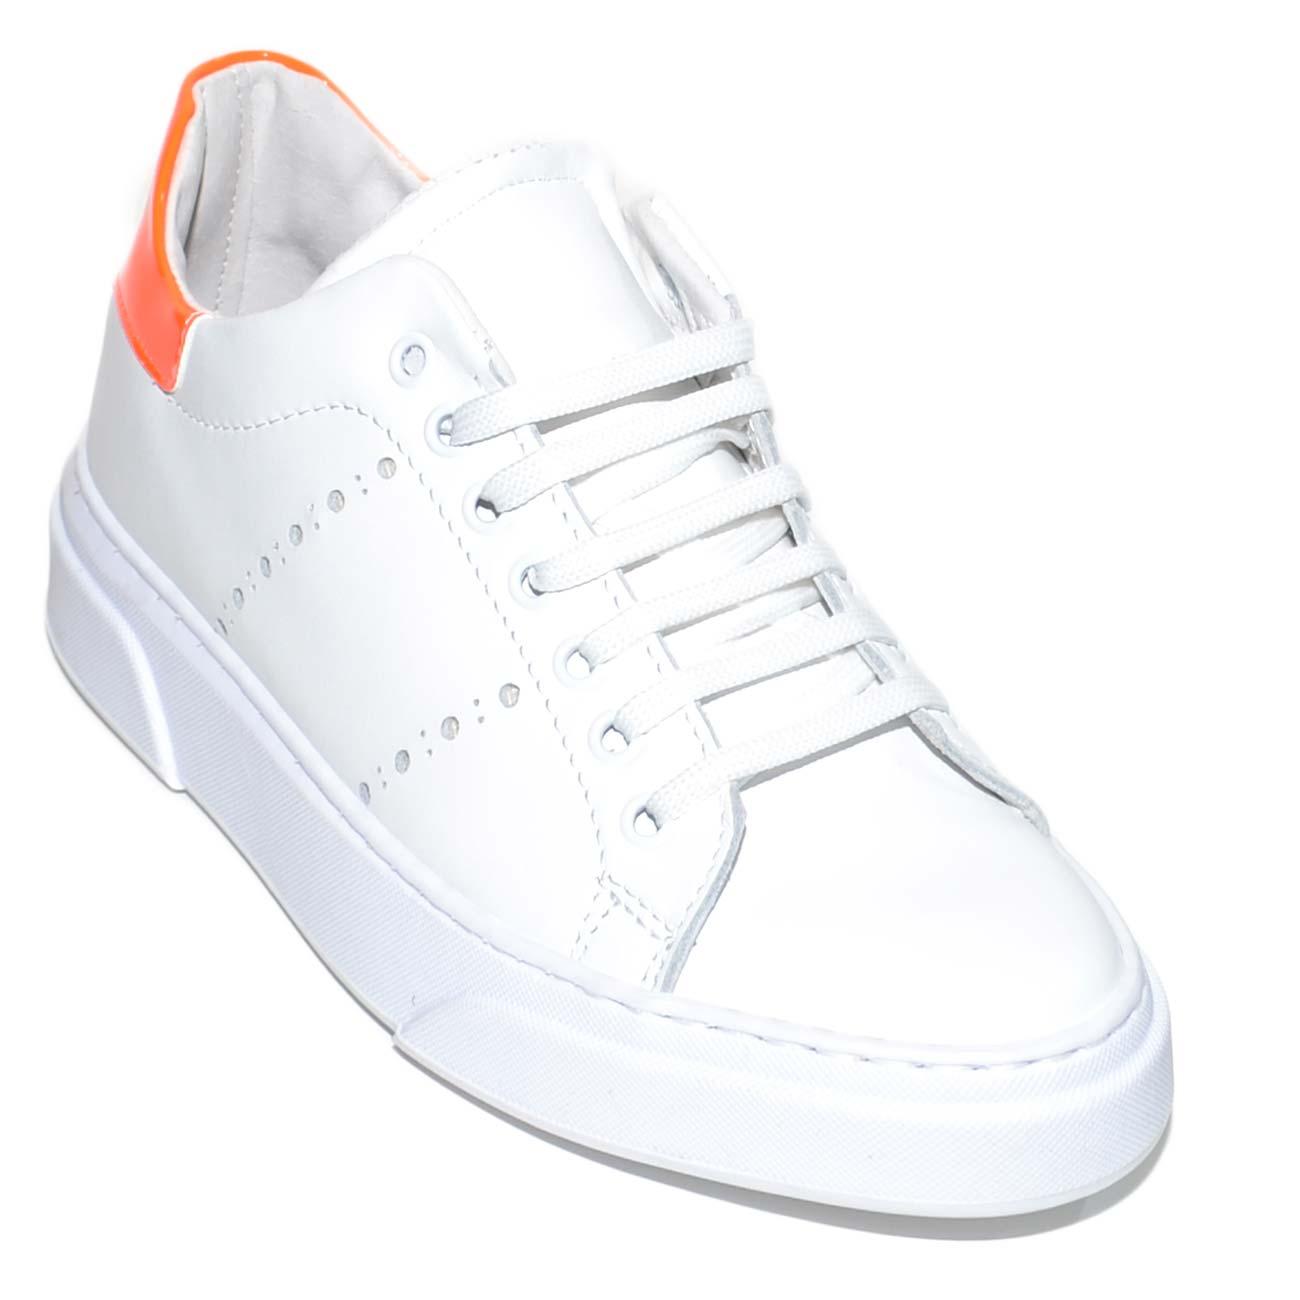 scarpe uomo moma giovanile casual comode e ultraleggere